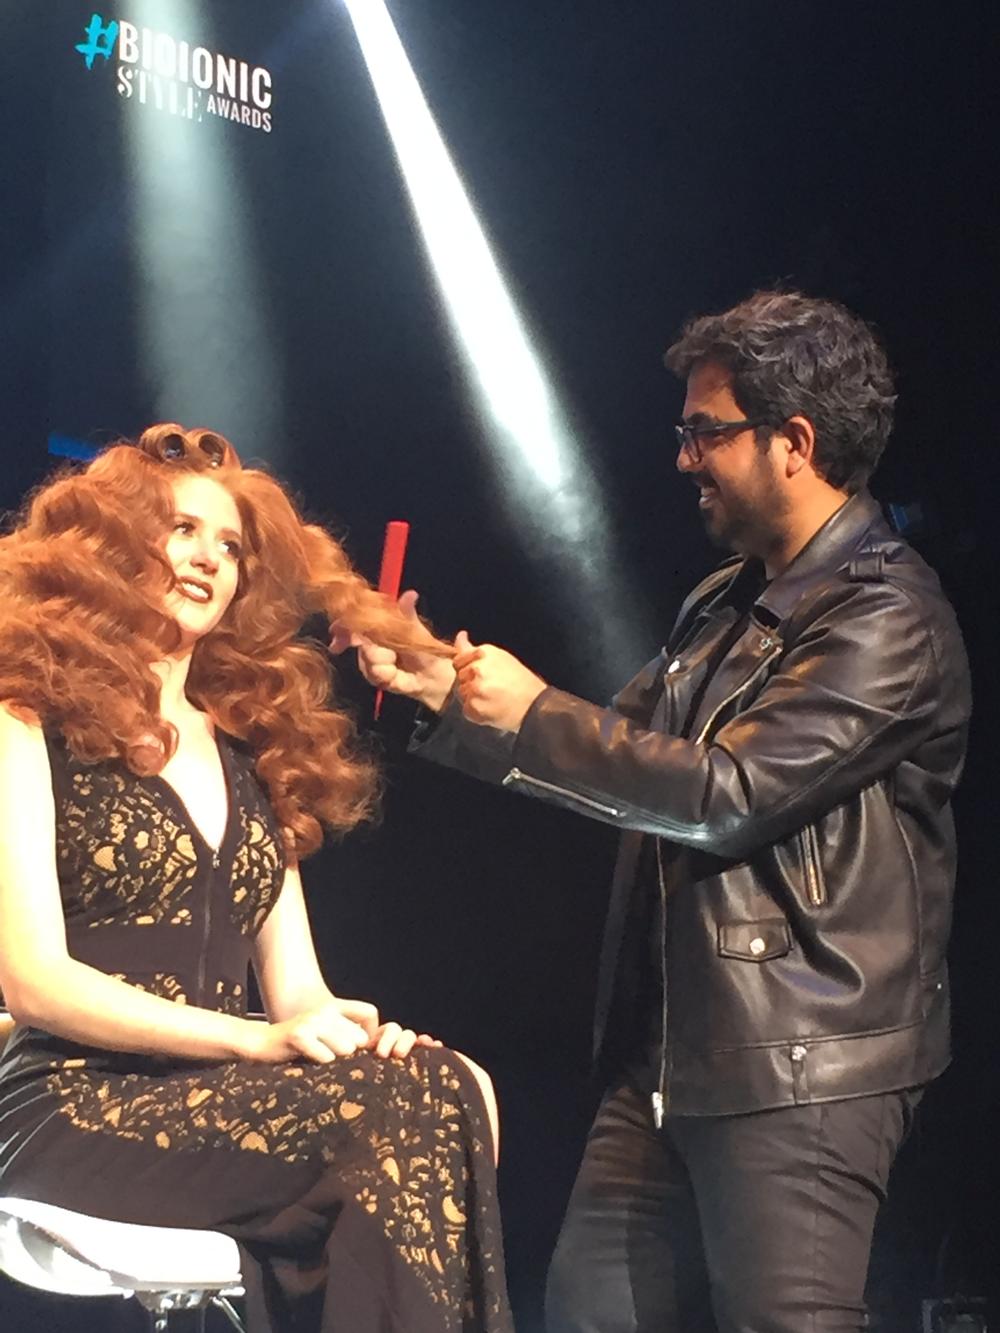 Mustafa Avci at work onstage